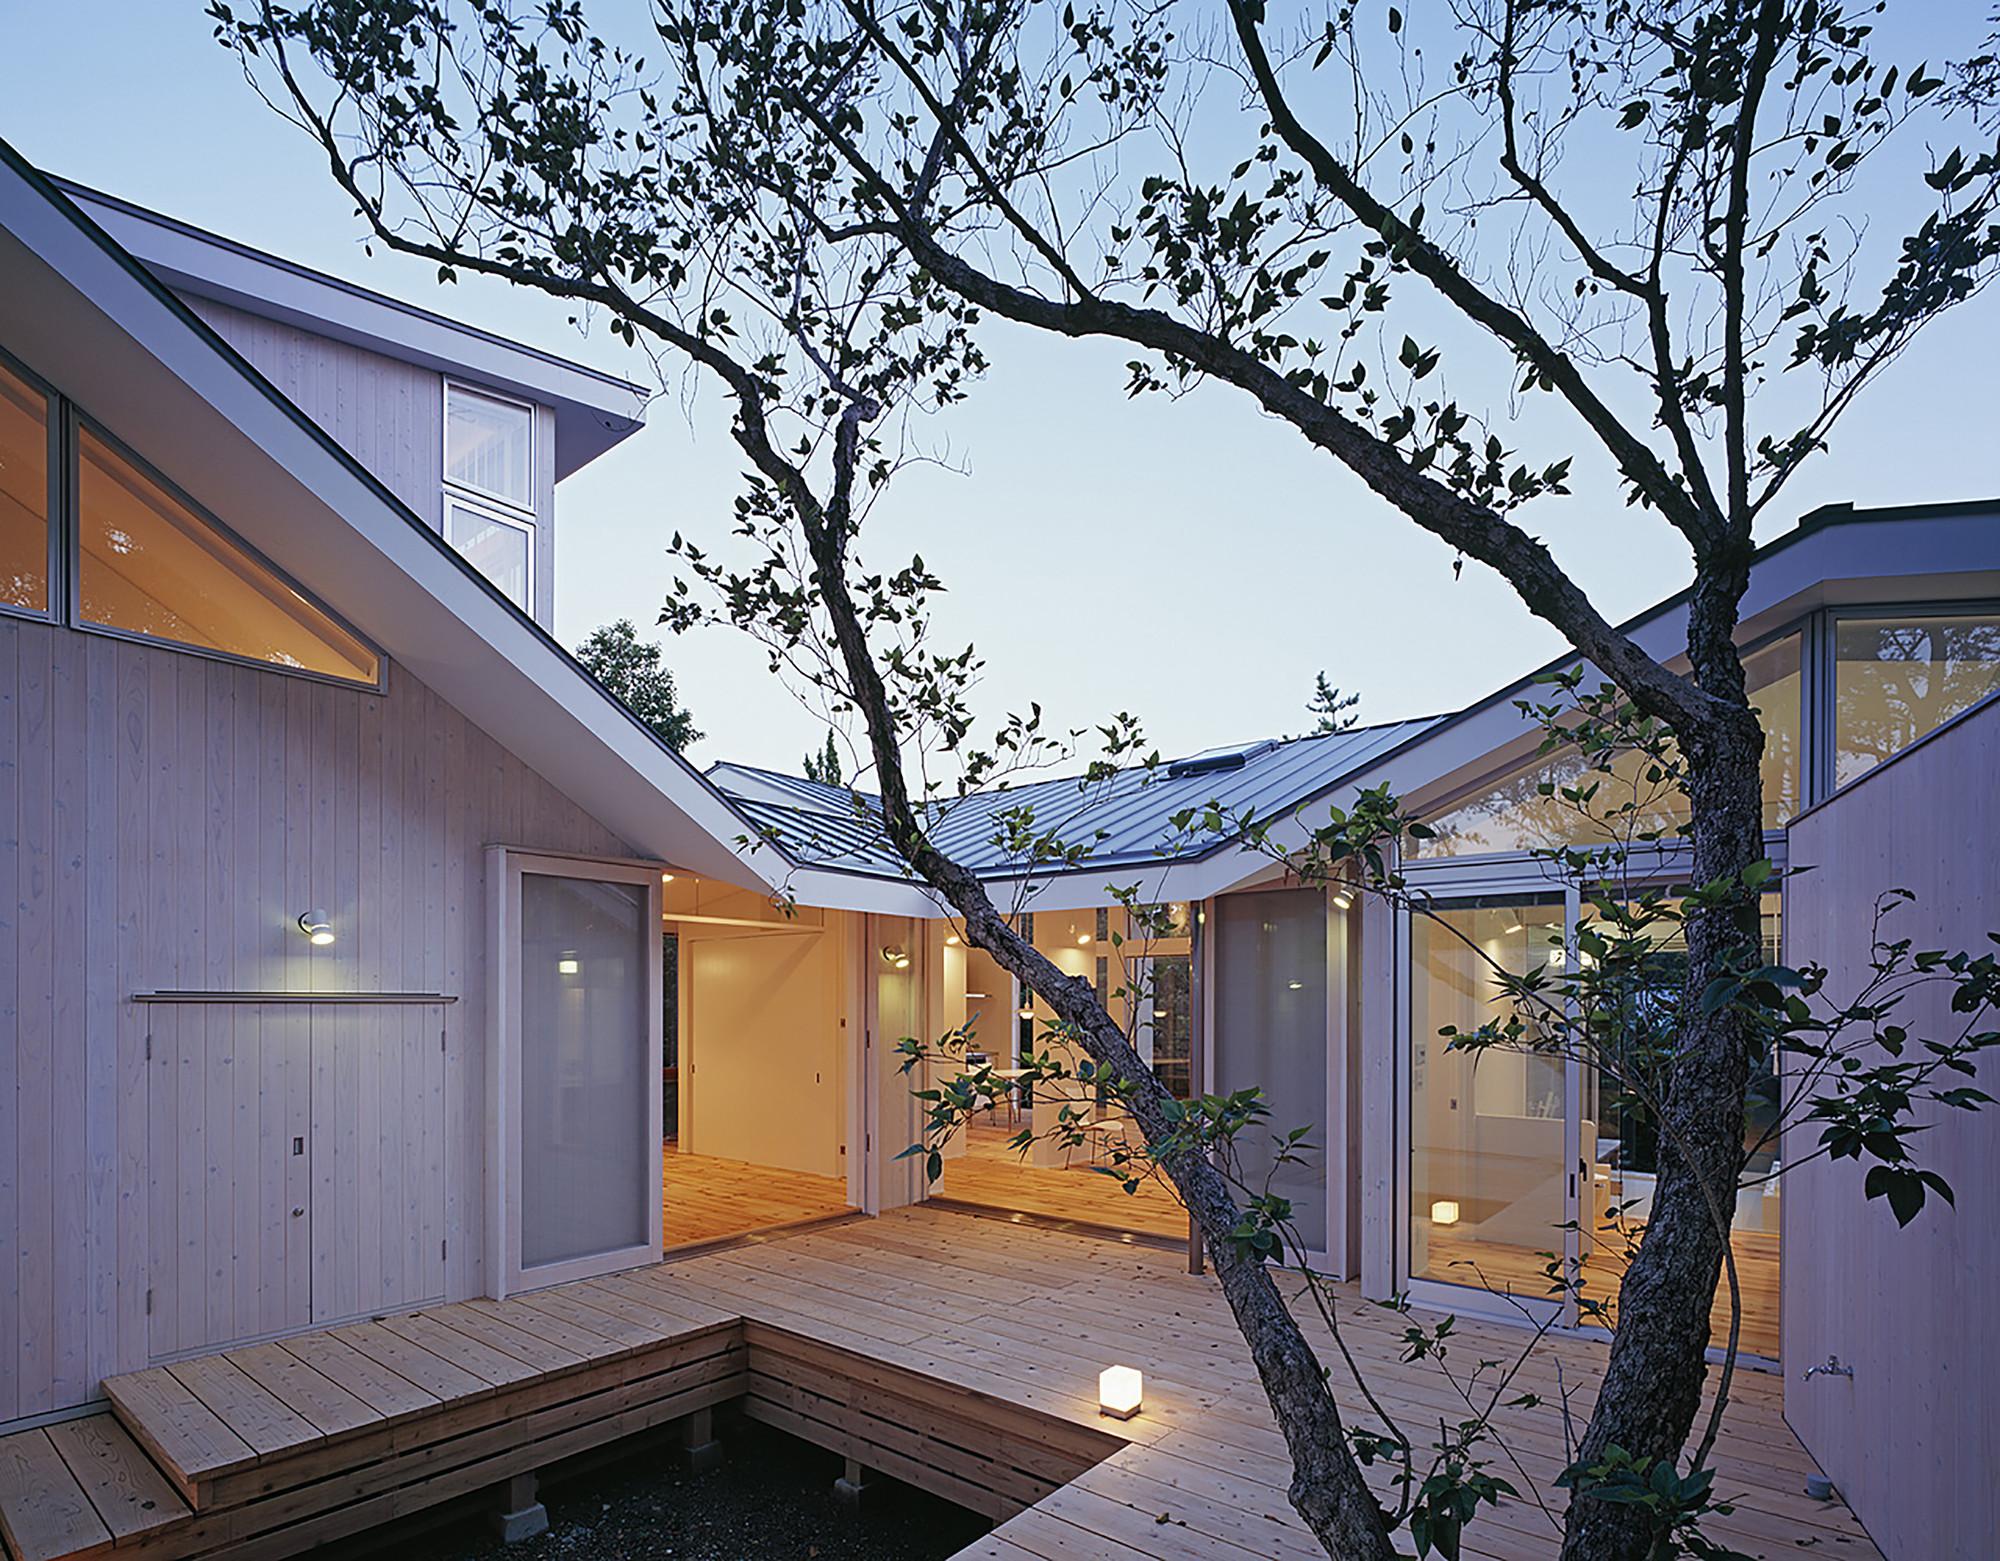 Villa ITO / Nakahira Architects, © Ken'ichi Suzuki